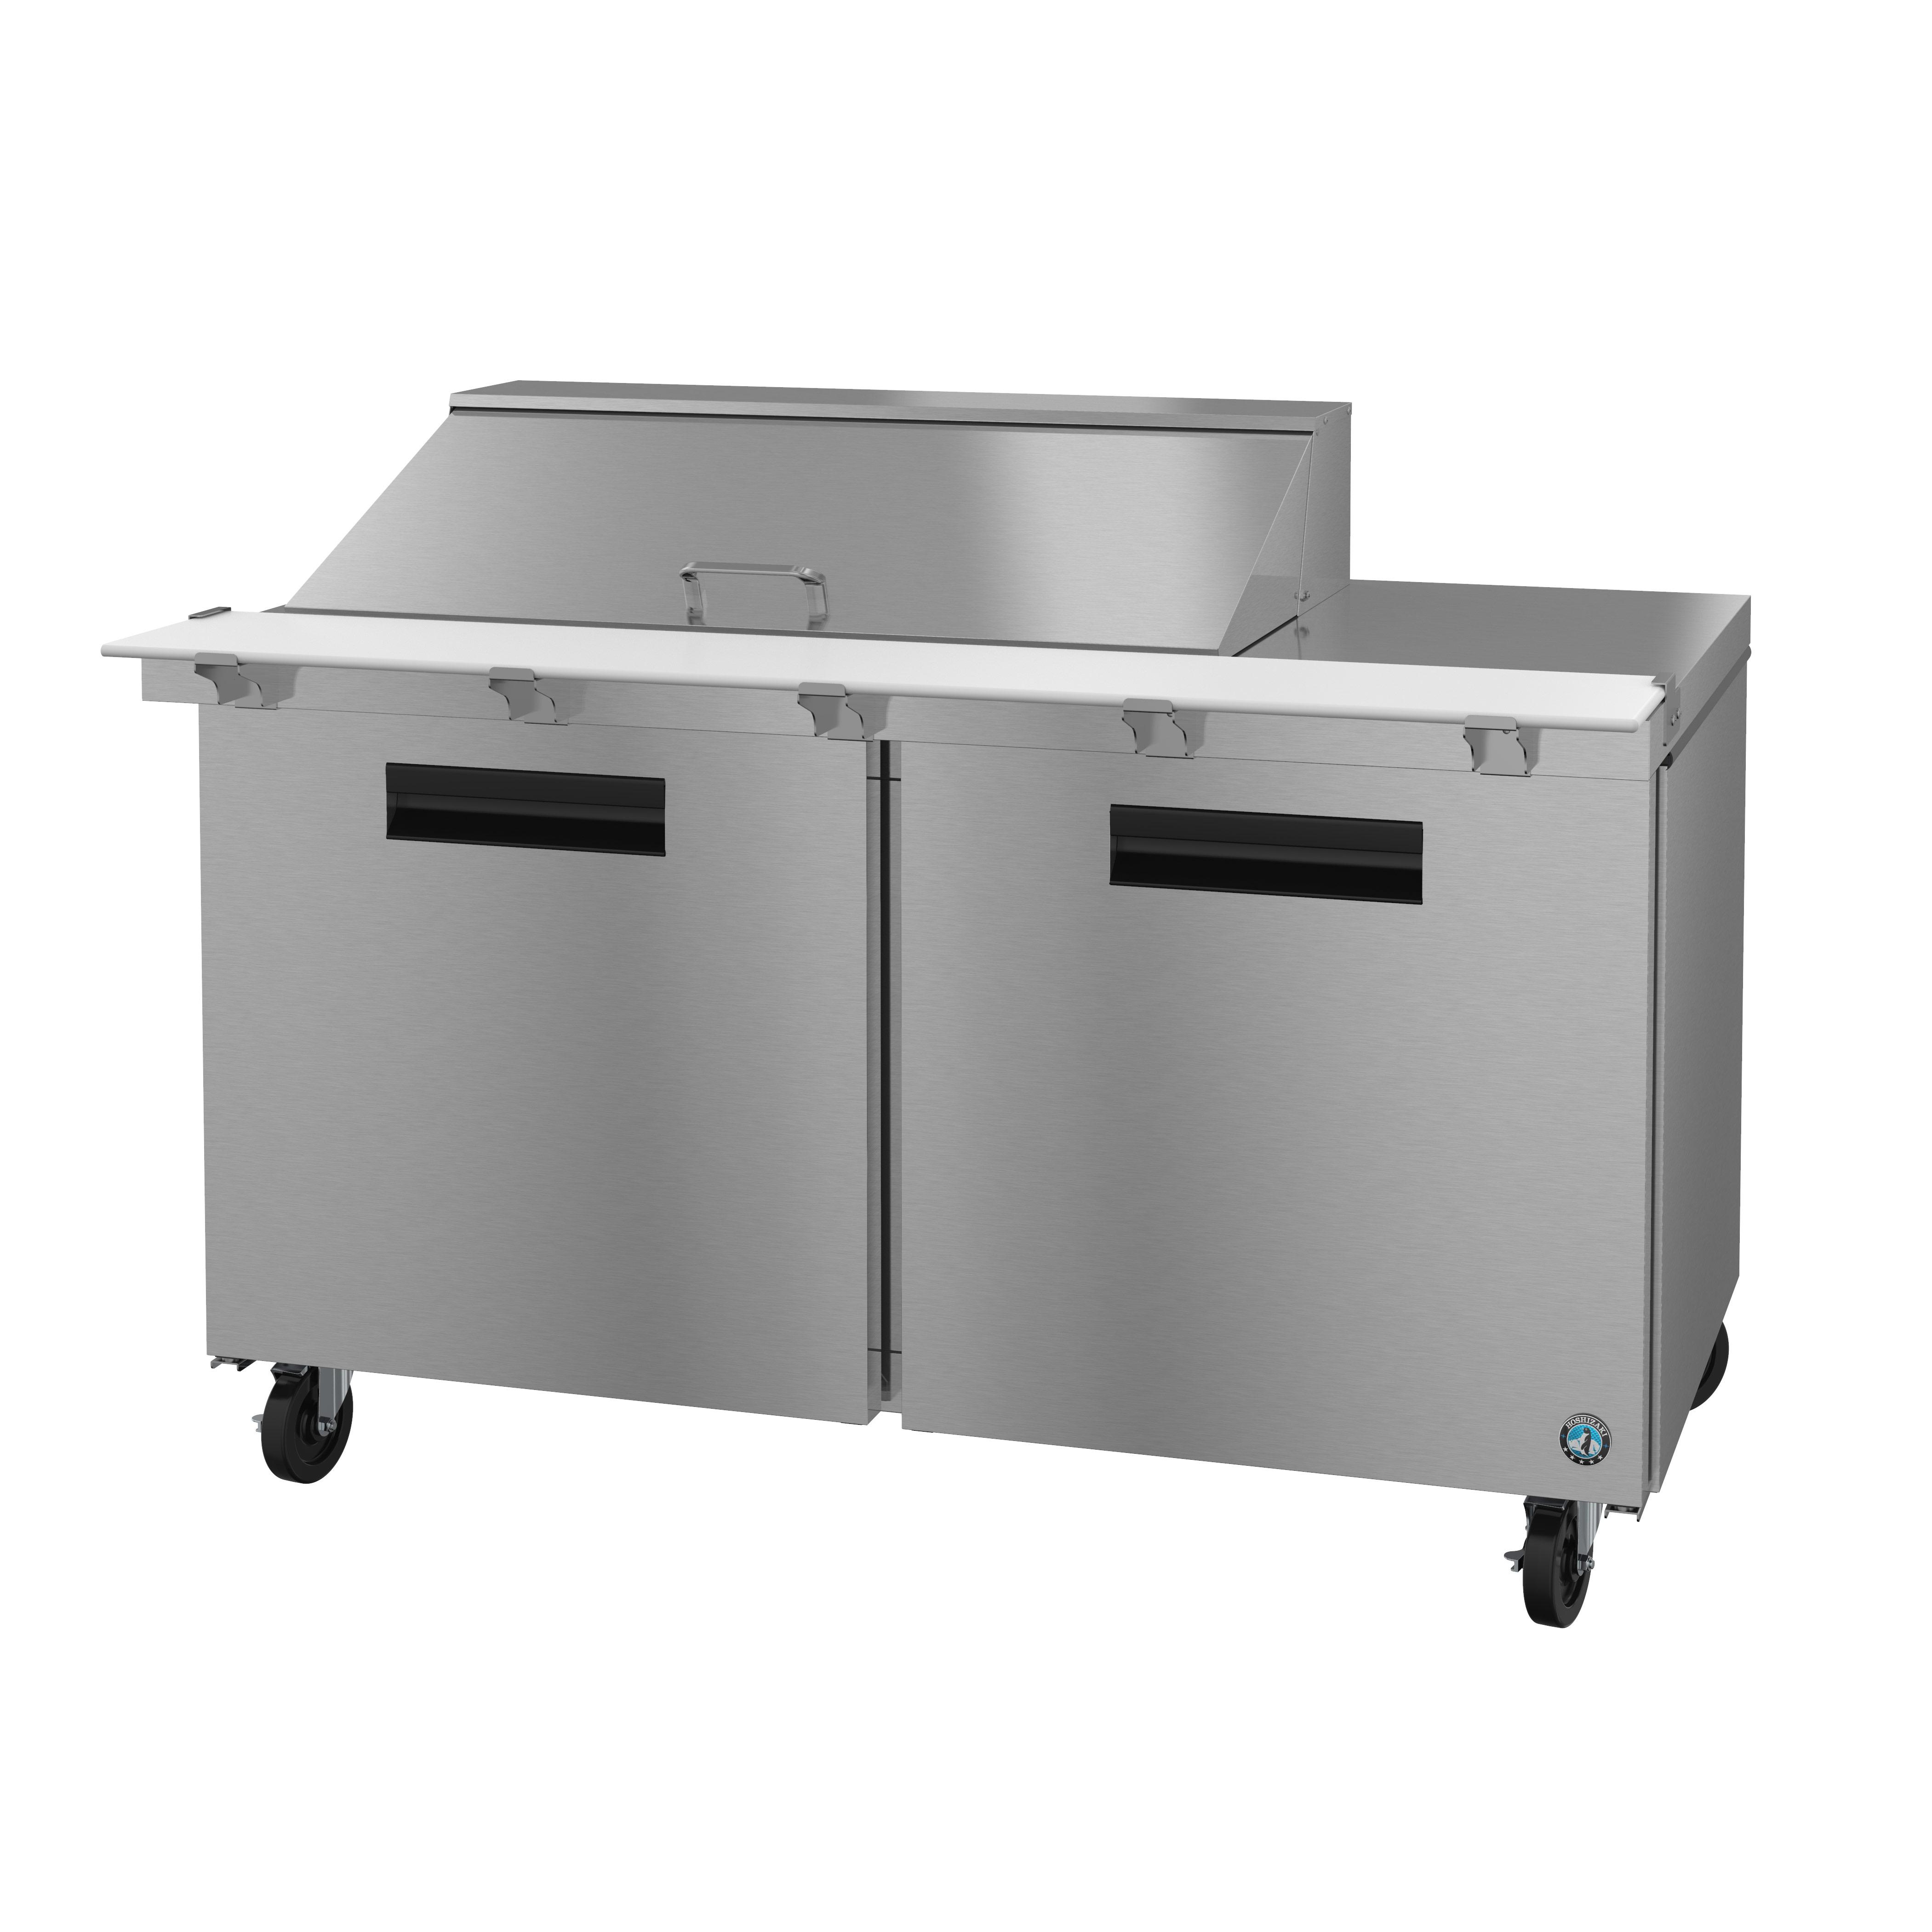 Hoshizaki SR60A-18M refrigerated counter, mega top sandwich / salad unit